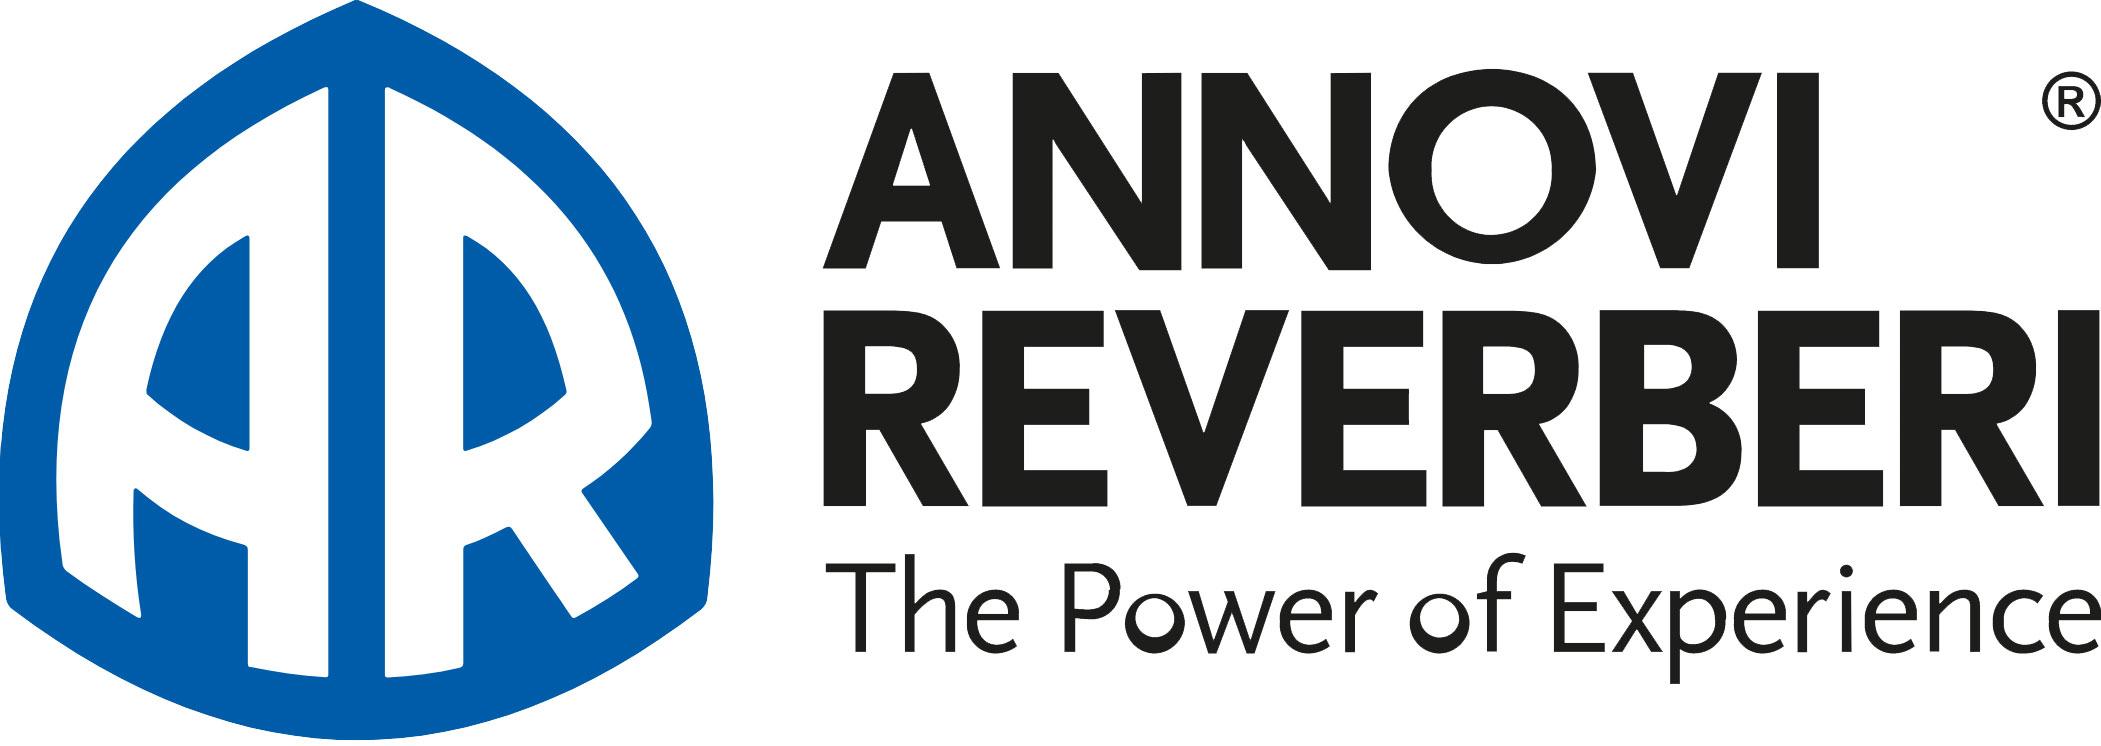 REAM elettroutensili Ferrara ANNOVI REVERBERI Logo